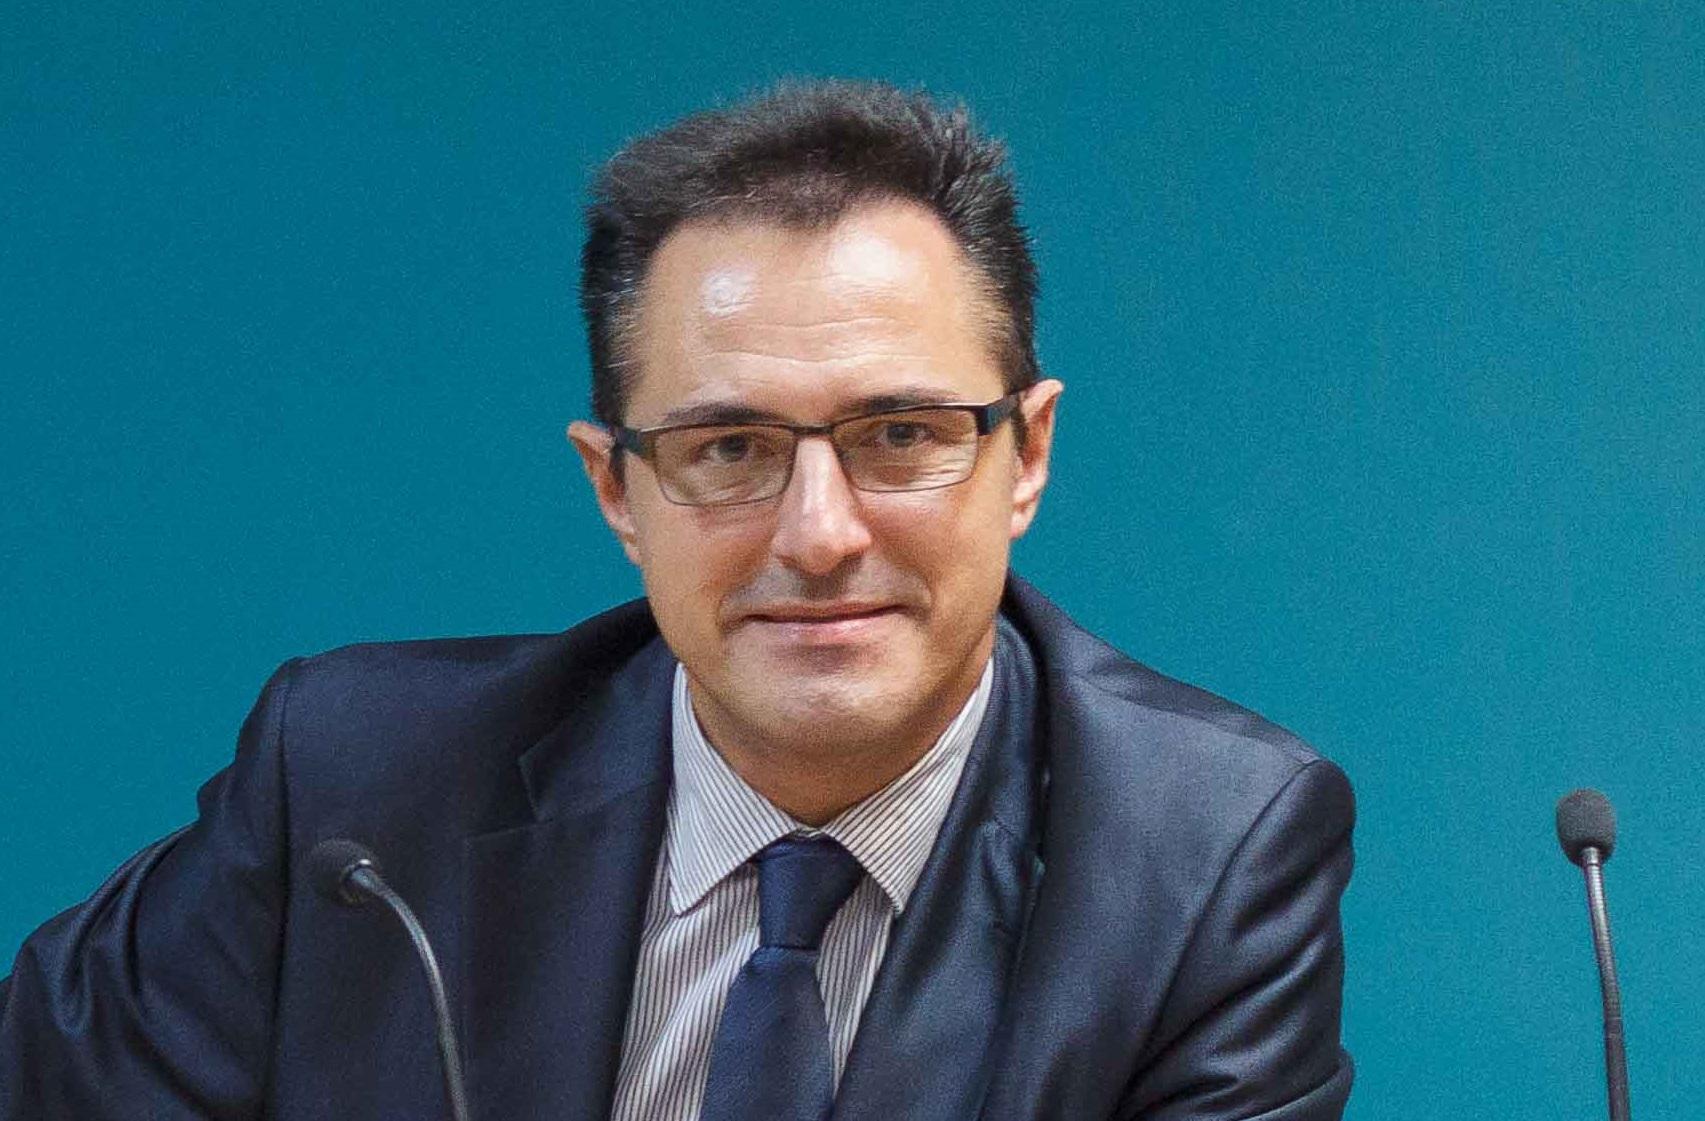 Perito Psicologo Forense Criminal - Barcelona - CONSULTORIA EN PSICOLOGIA LEGAL Y FORENSE - Dr. Bernat-N. Tiffon